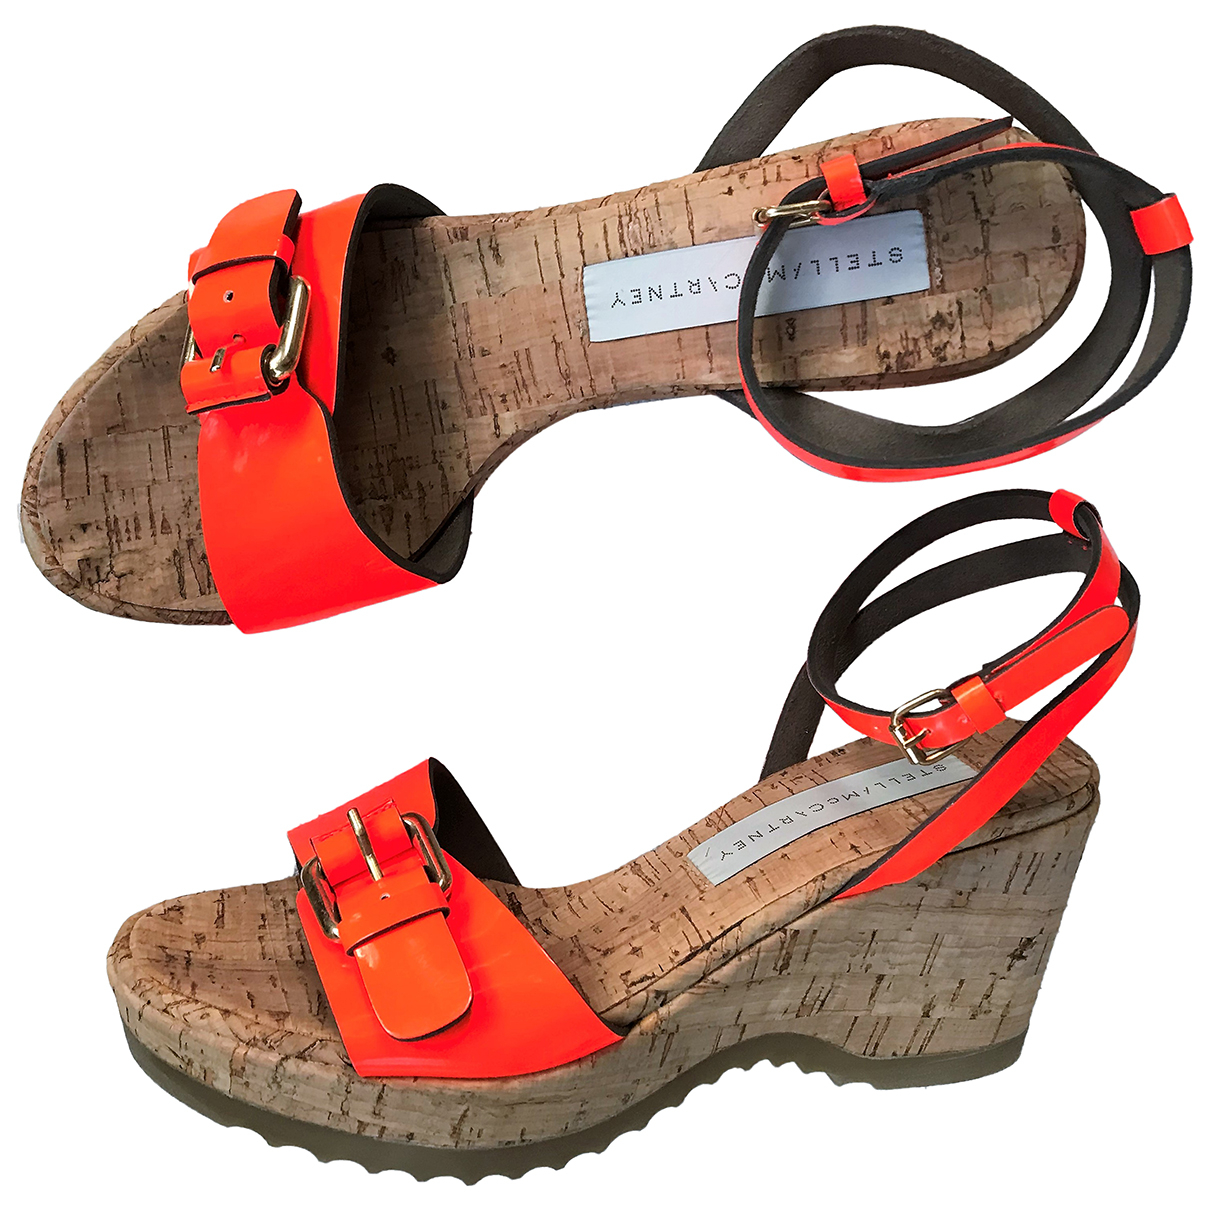 Sandalias de Lona Stella Mccartney